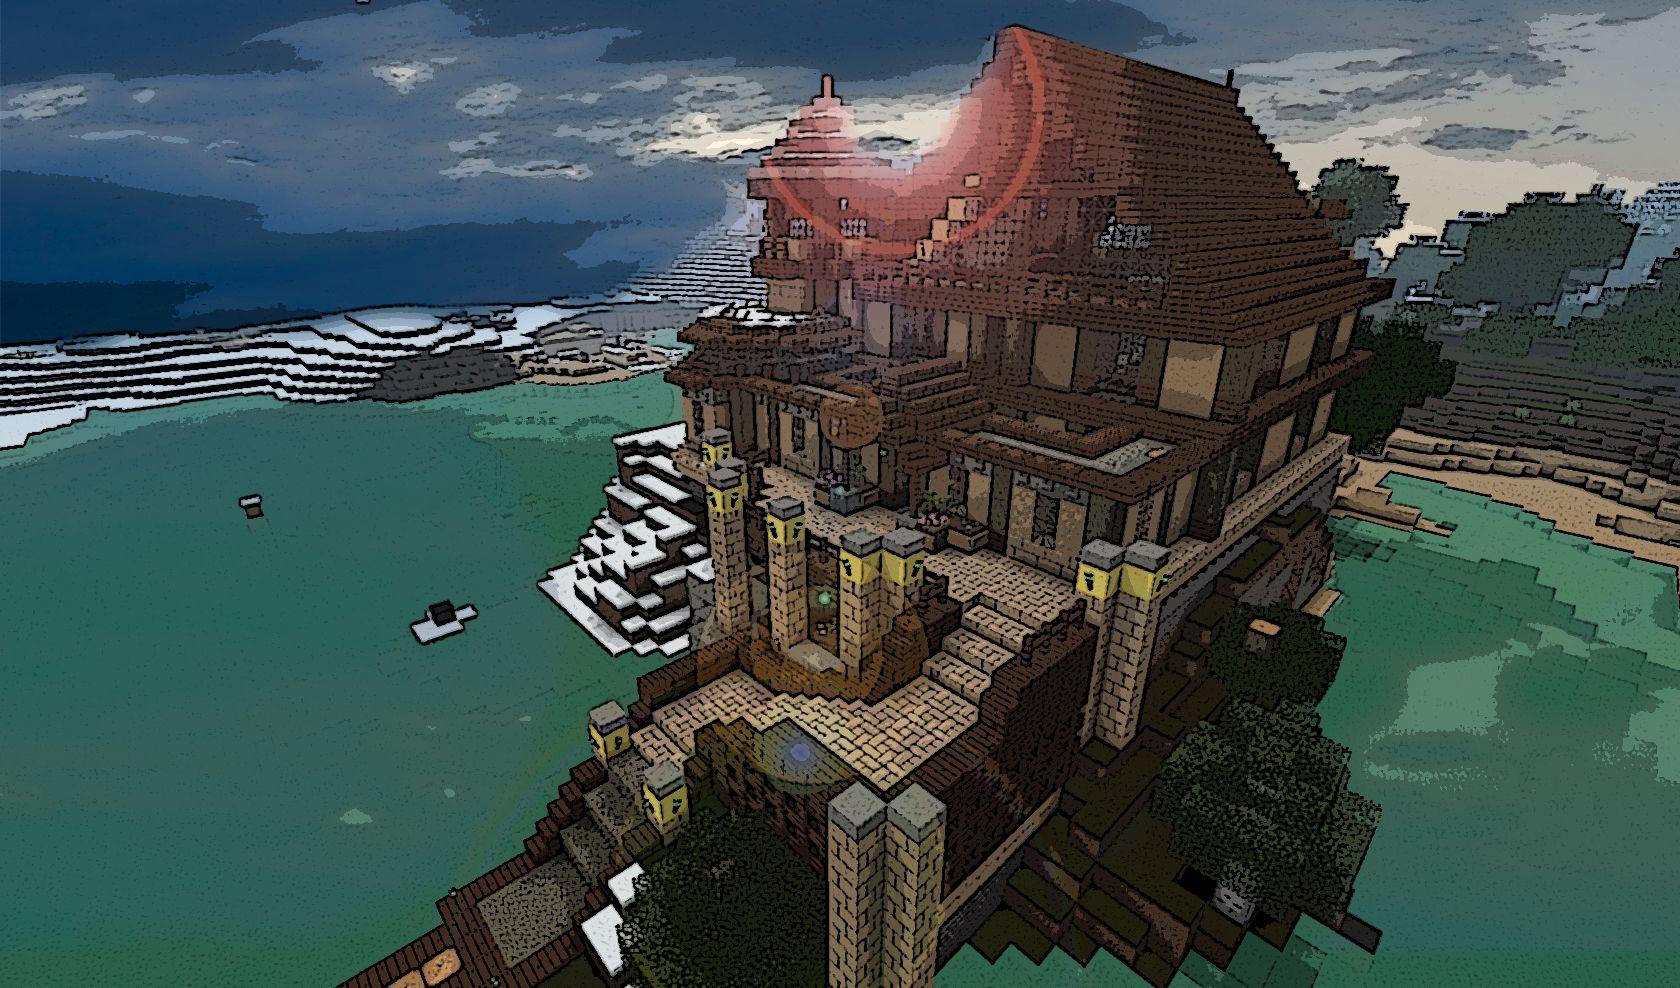 Minecraft Architecture  Chateau De Resquer - Screenshots - Show Your Creation